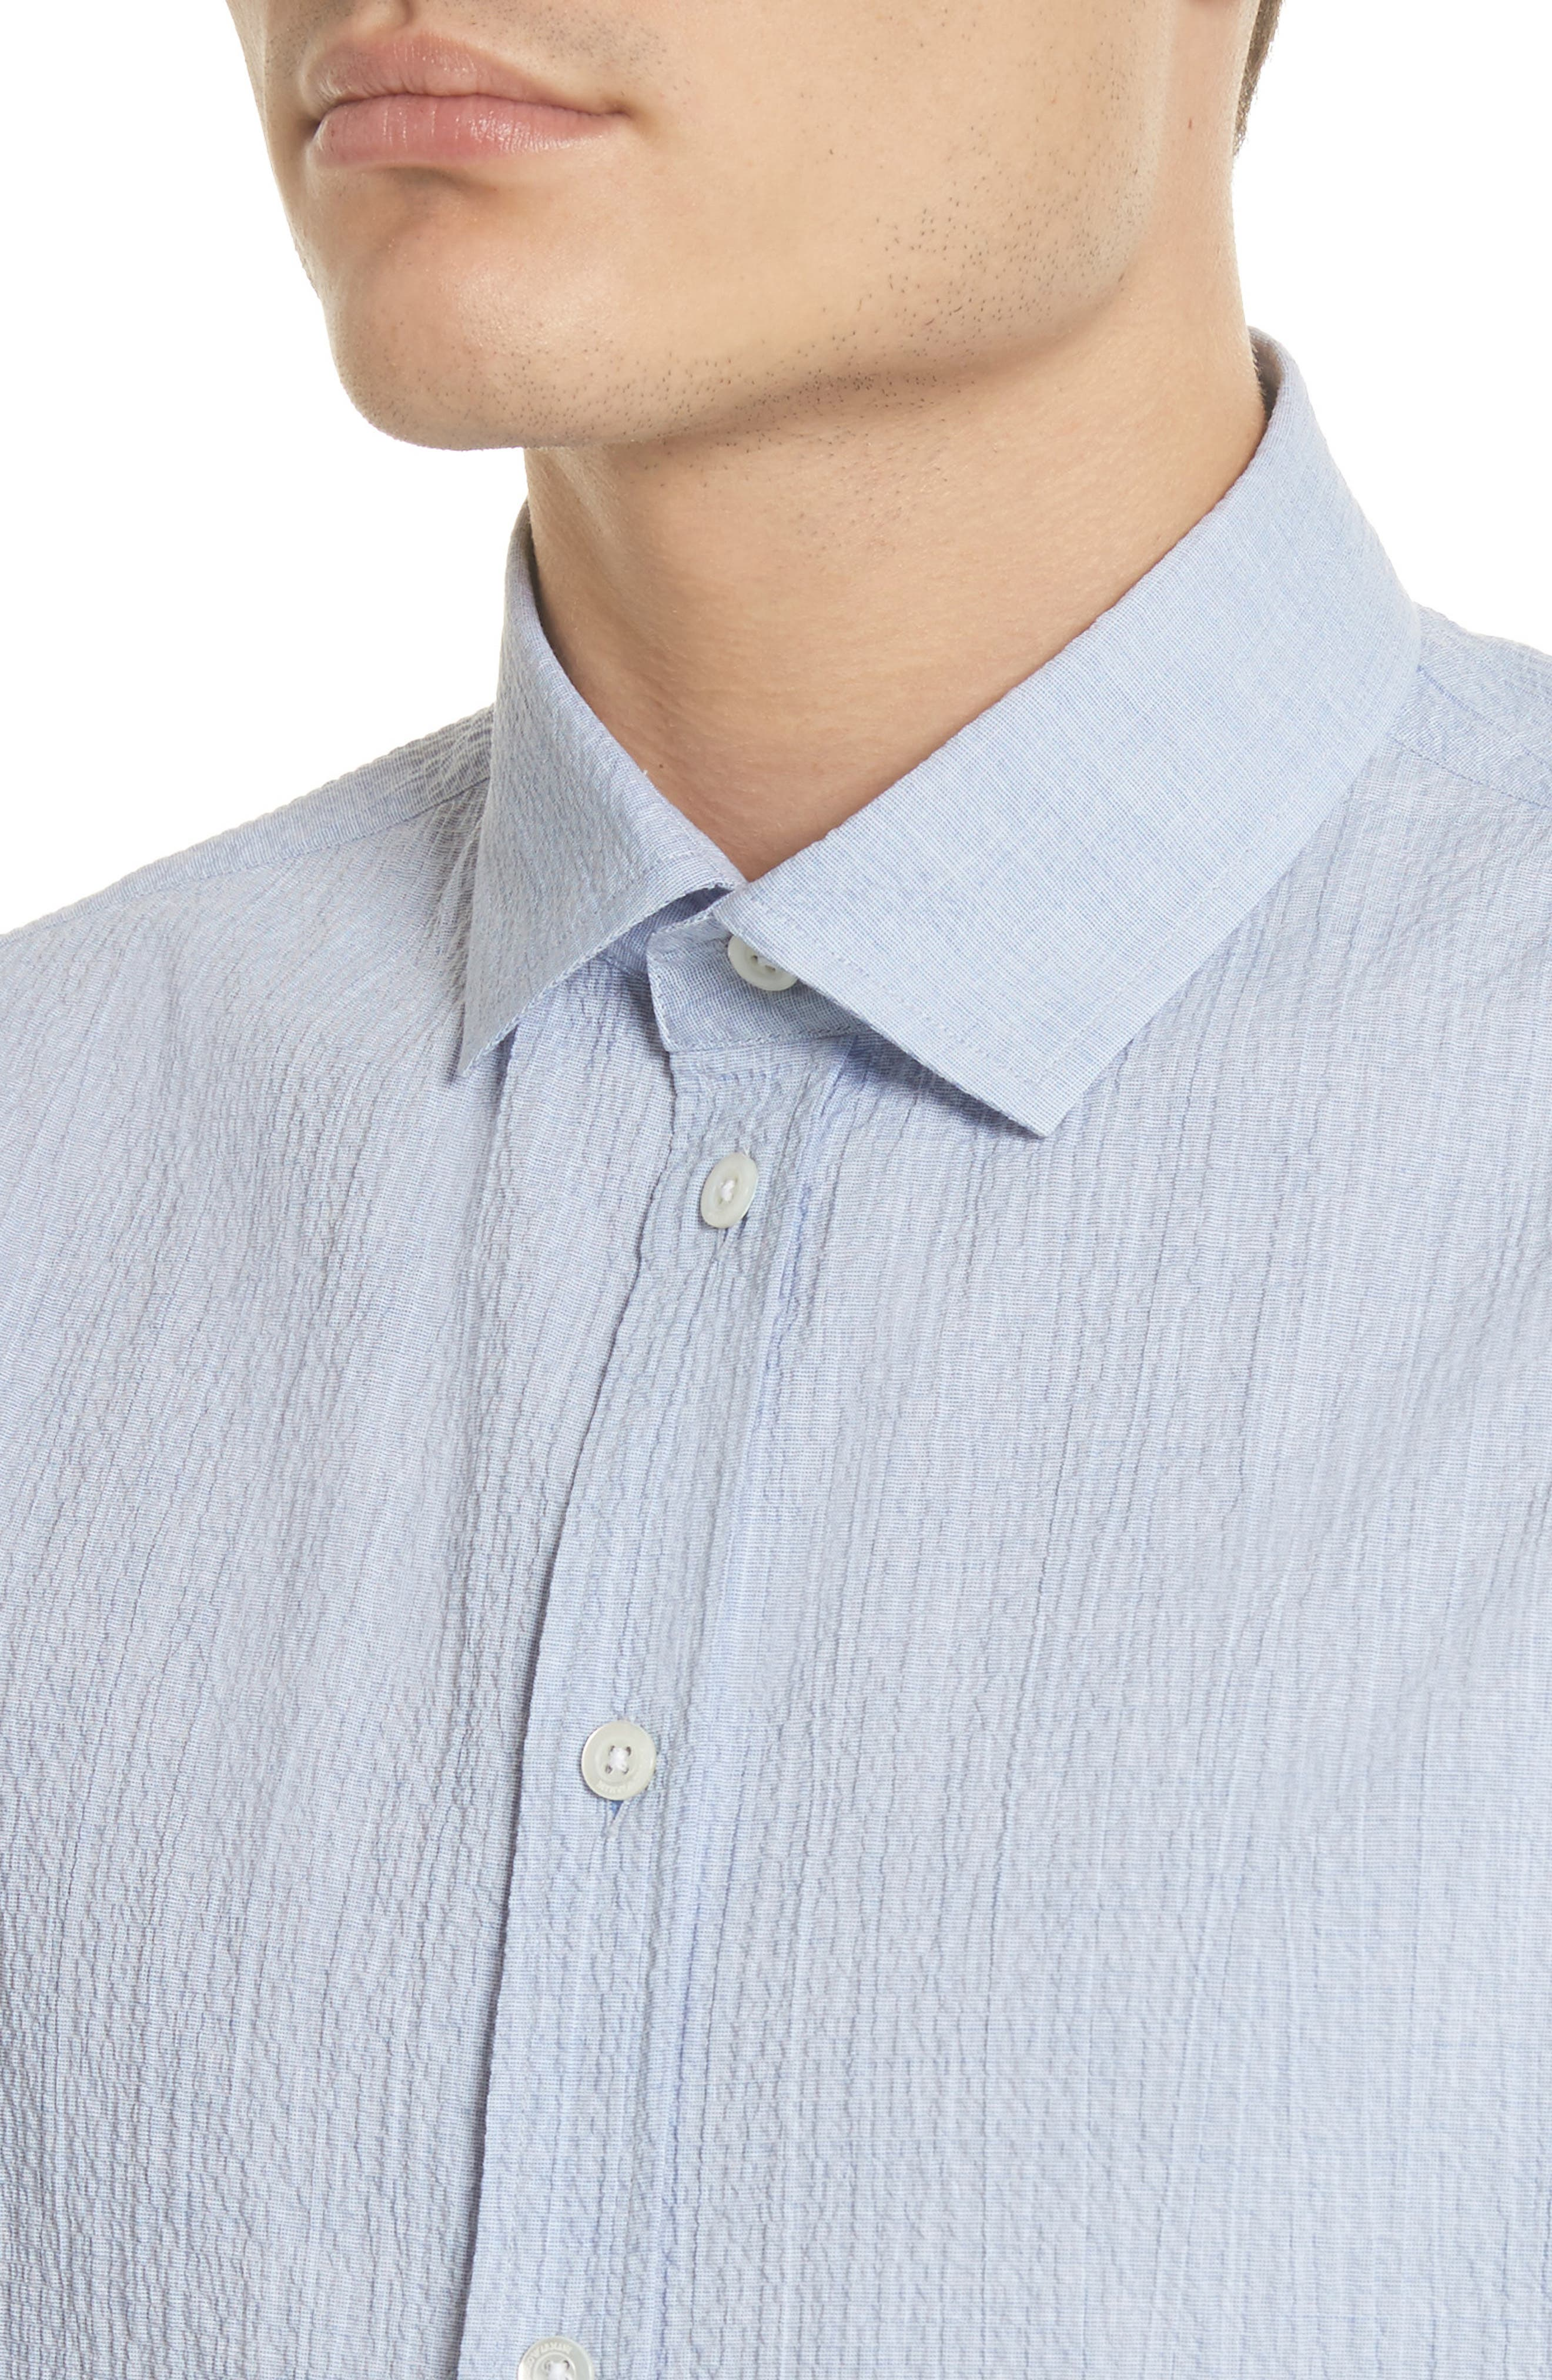 Regular Fit Seersucker Sport Shirt,                             Alternate thumbnail 4, color,                             428